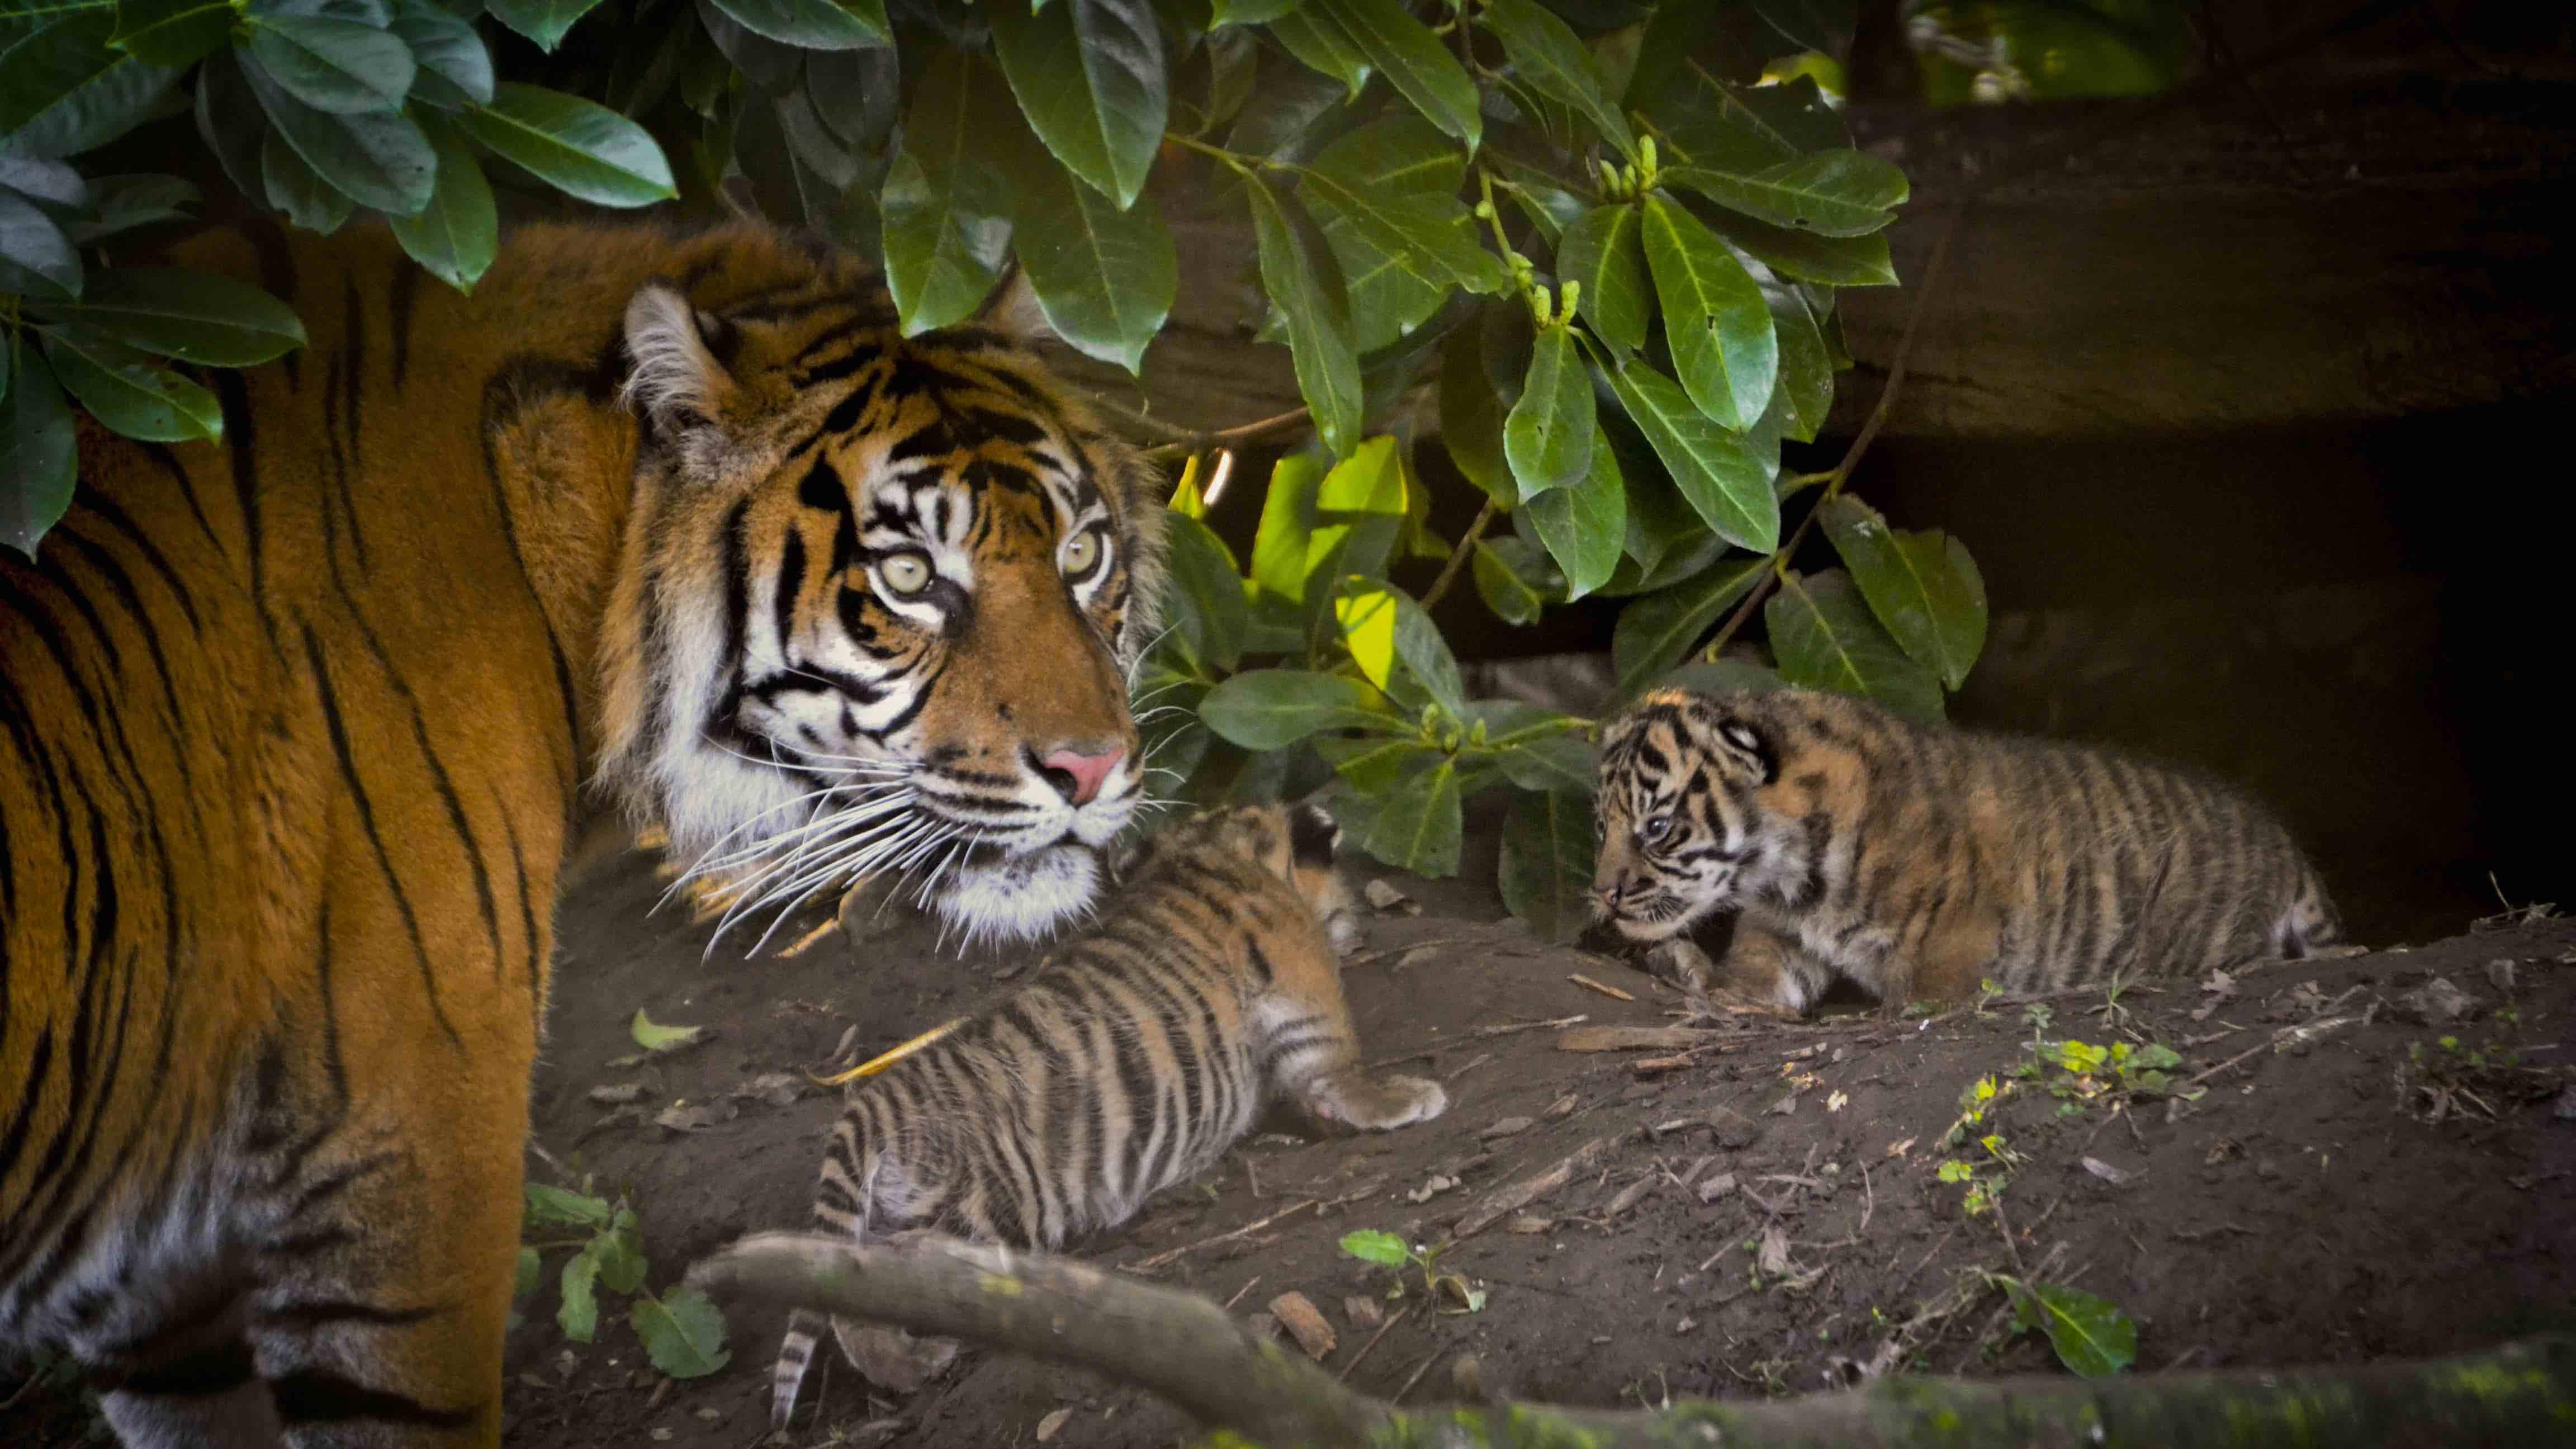 tigers face unprecedented threat